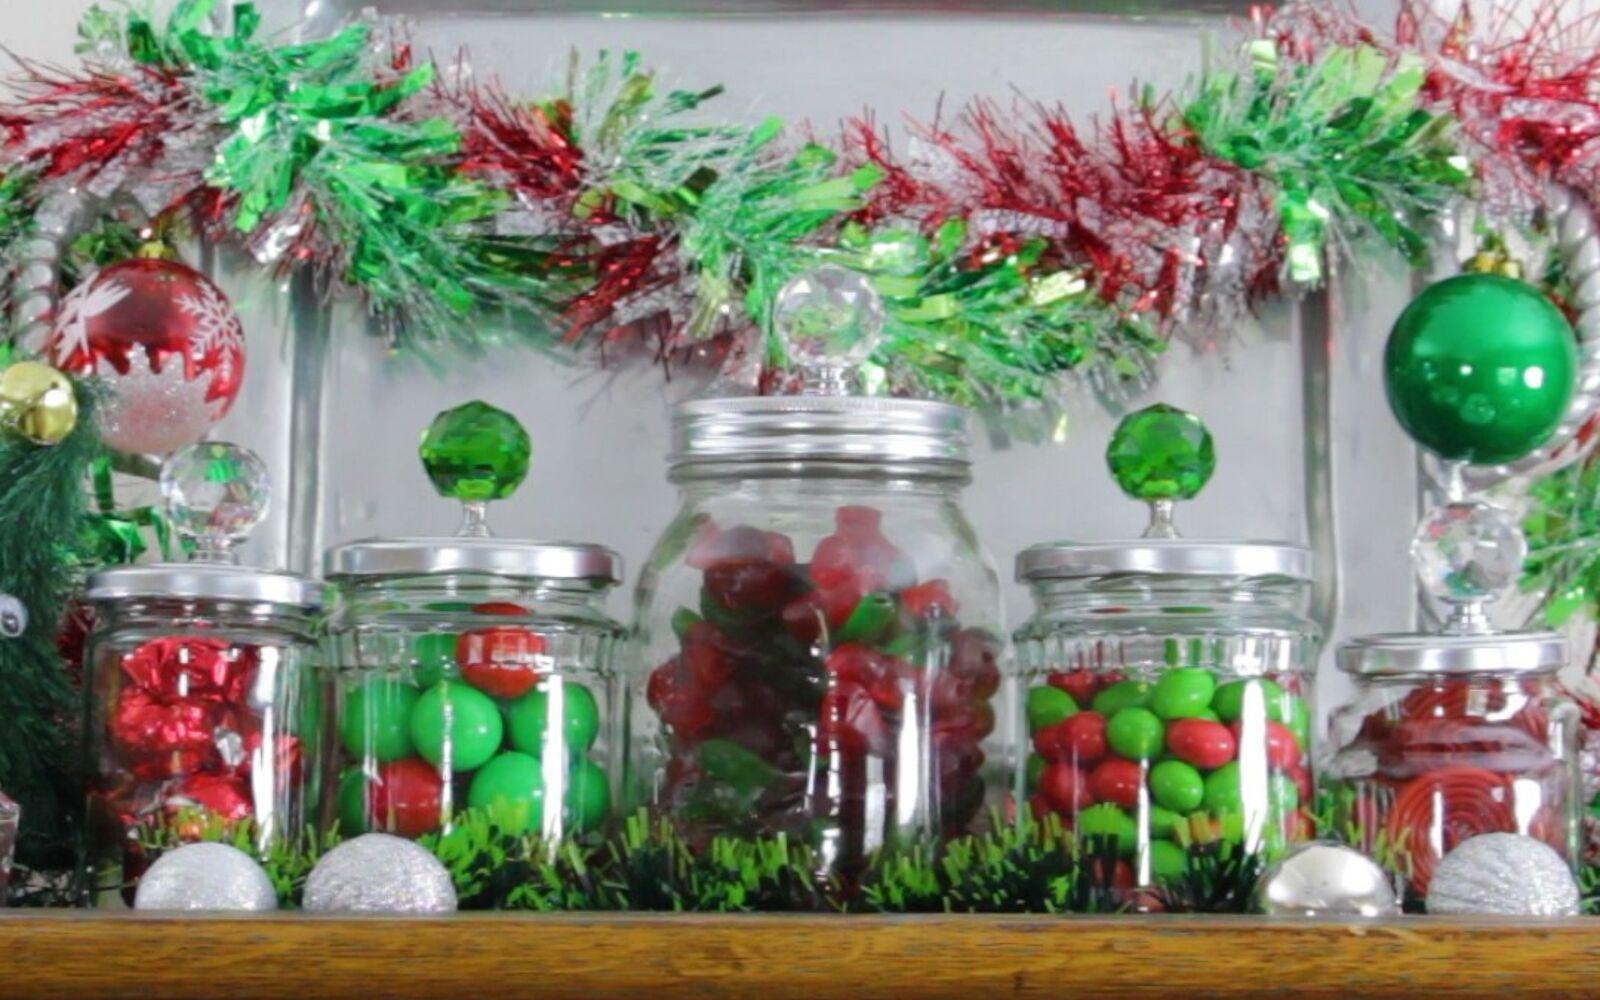 s 30 great mason jar ideas you have to try, Screw Decorative Seasonal Knobs On The Jar